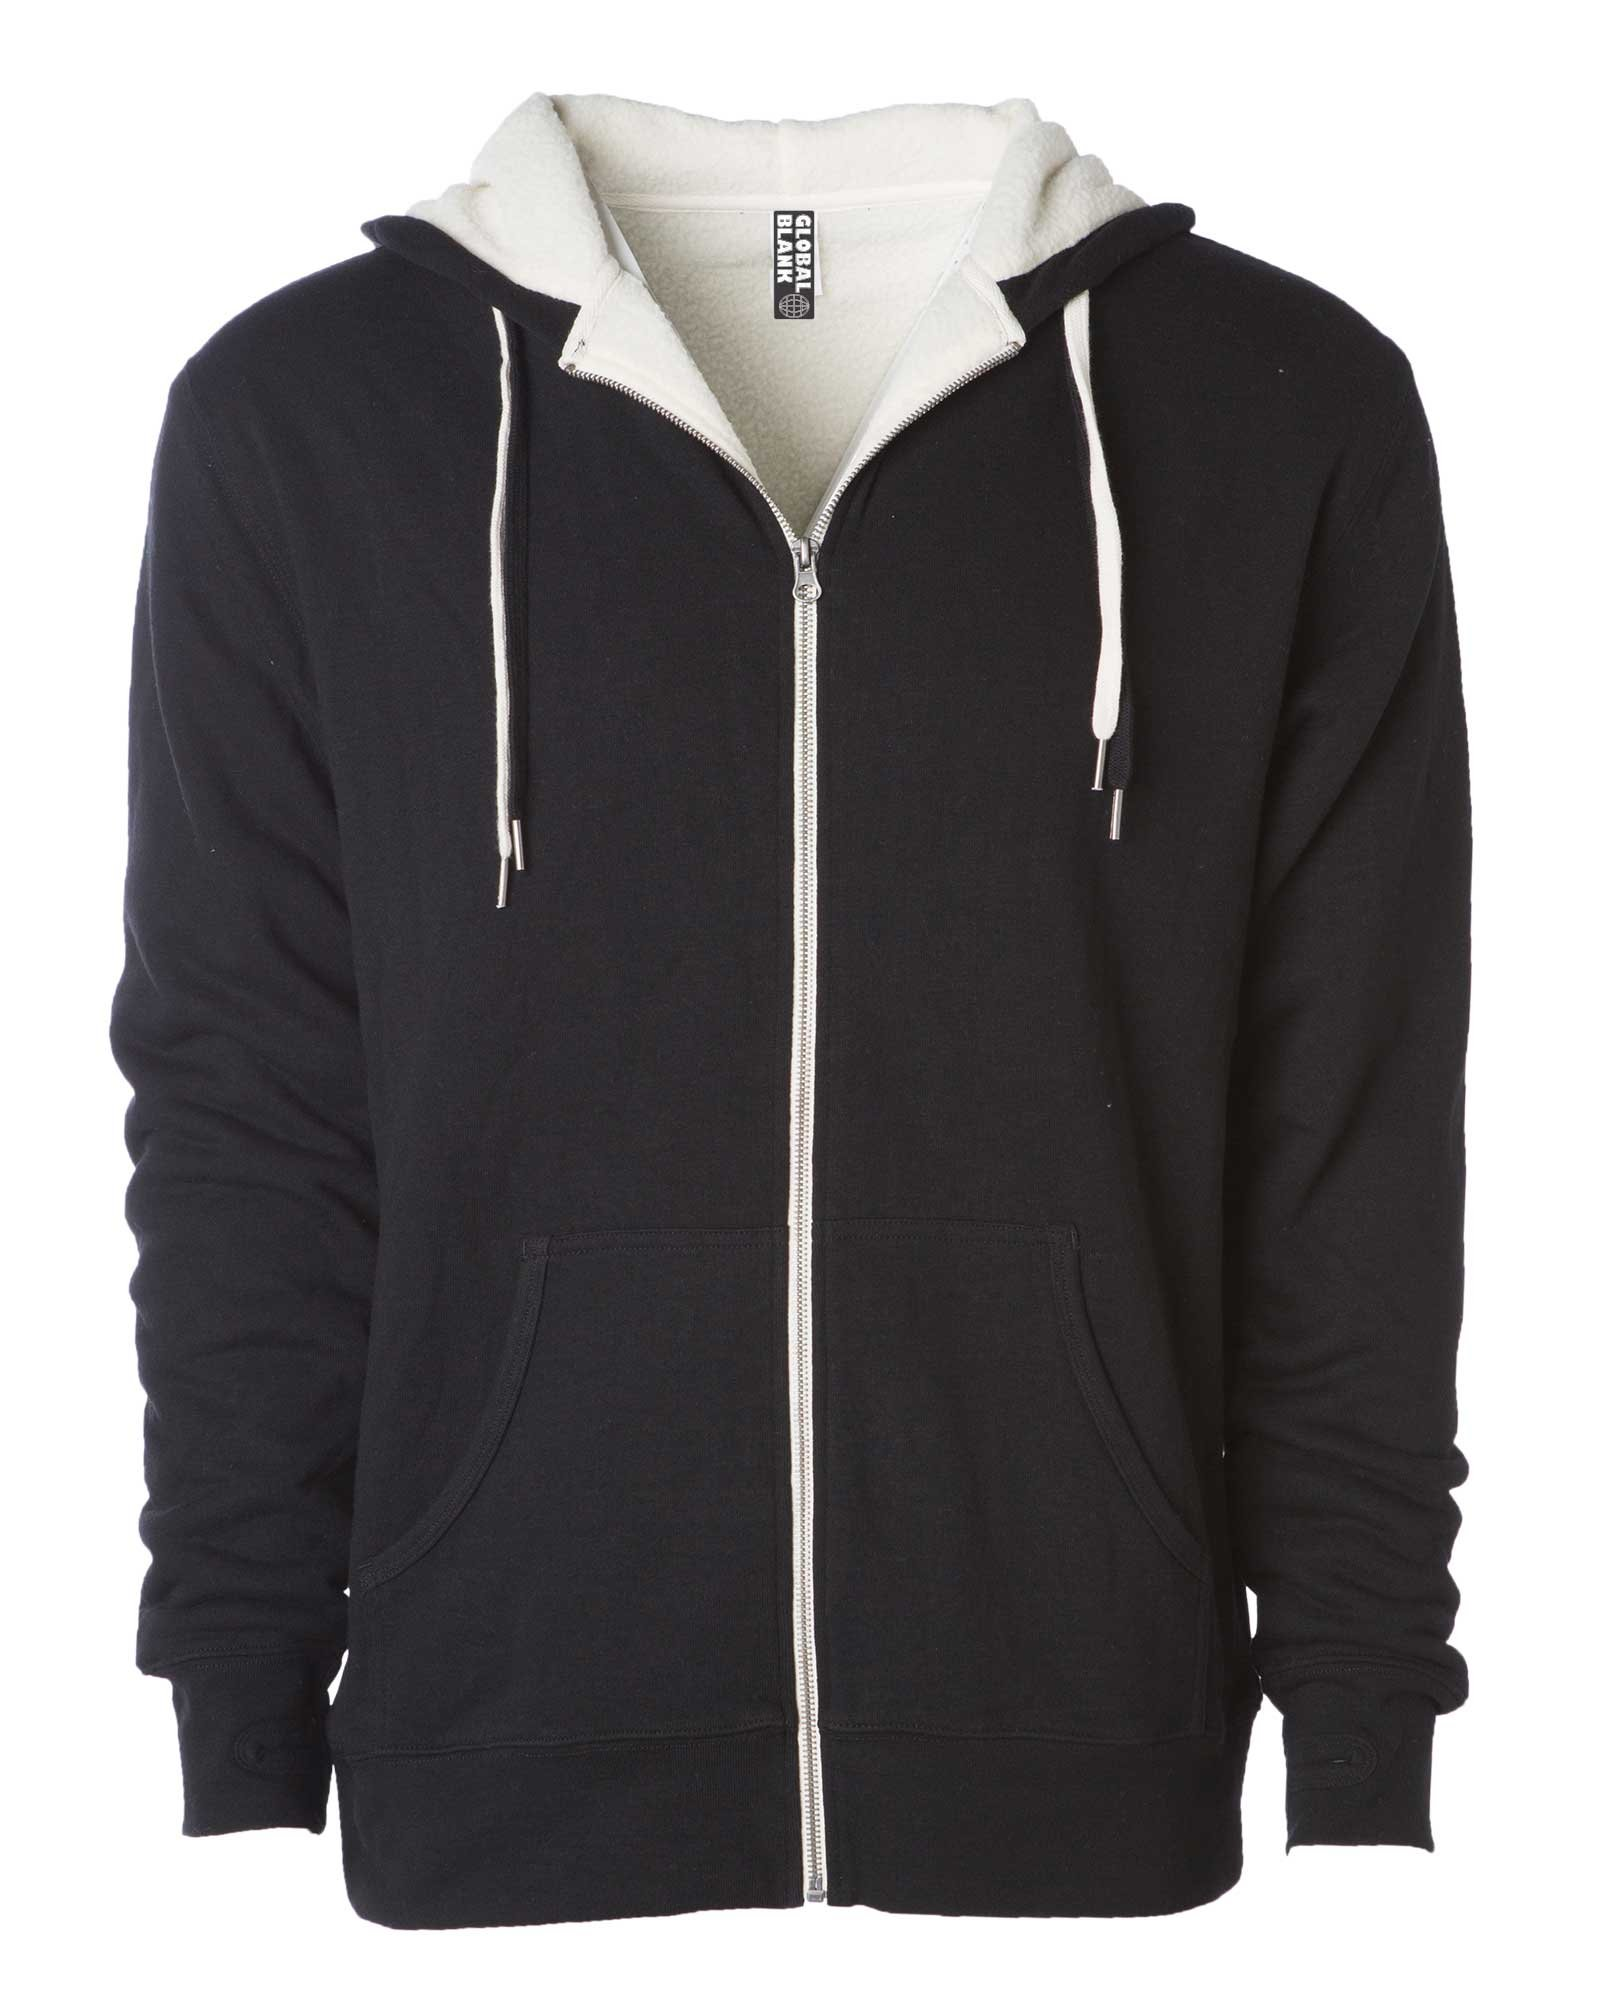 Global Heavyweight Sherpa Lined Zip Up Hoodie For Men Hooded Sweatshirt Fleece Jacket Black M